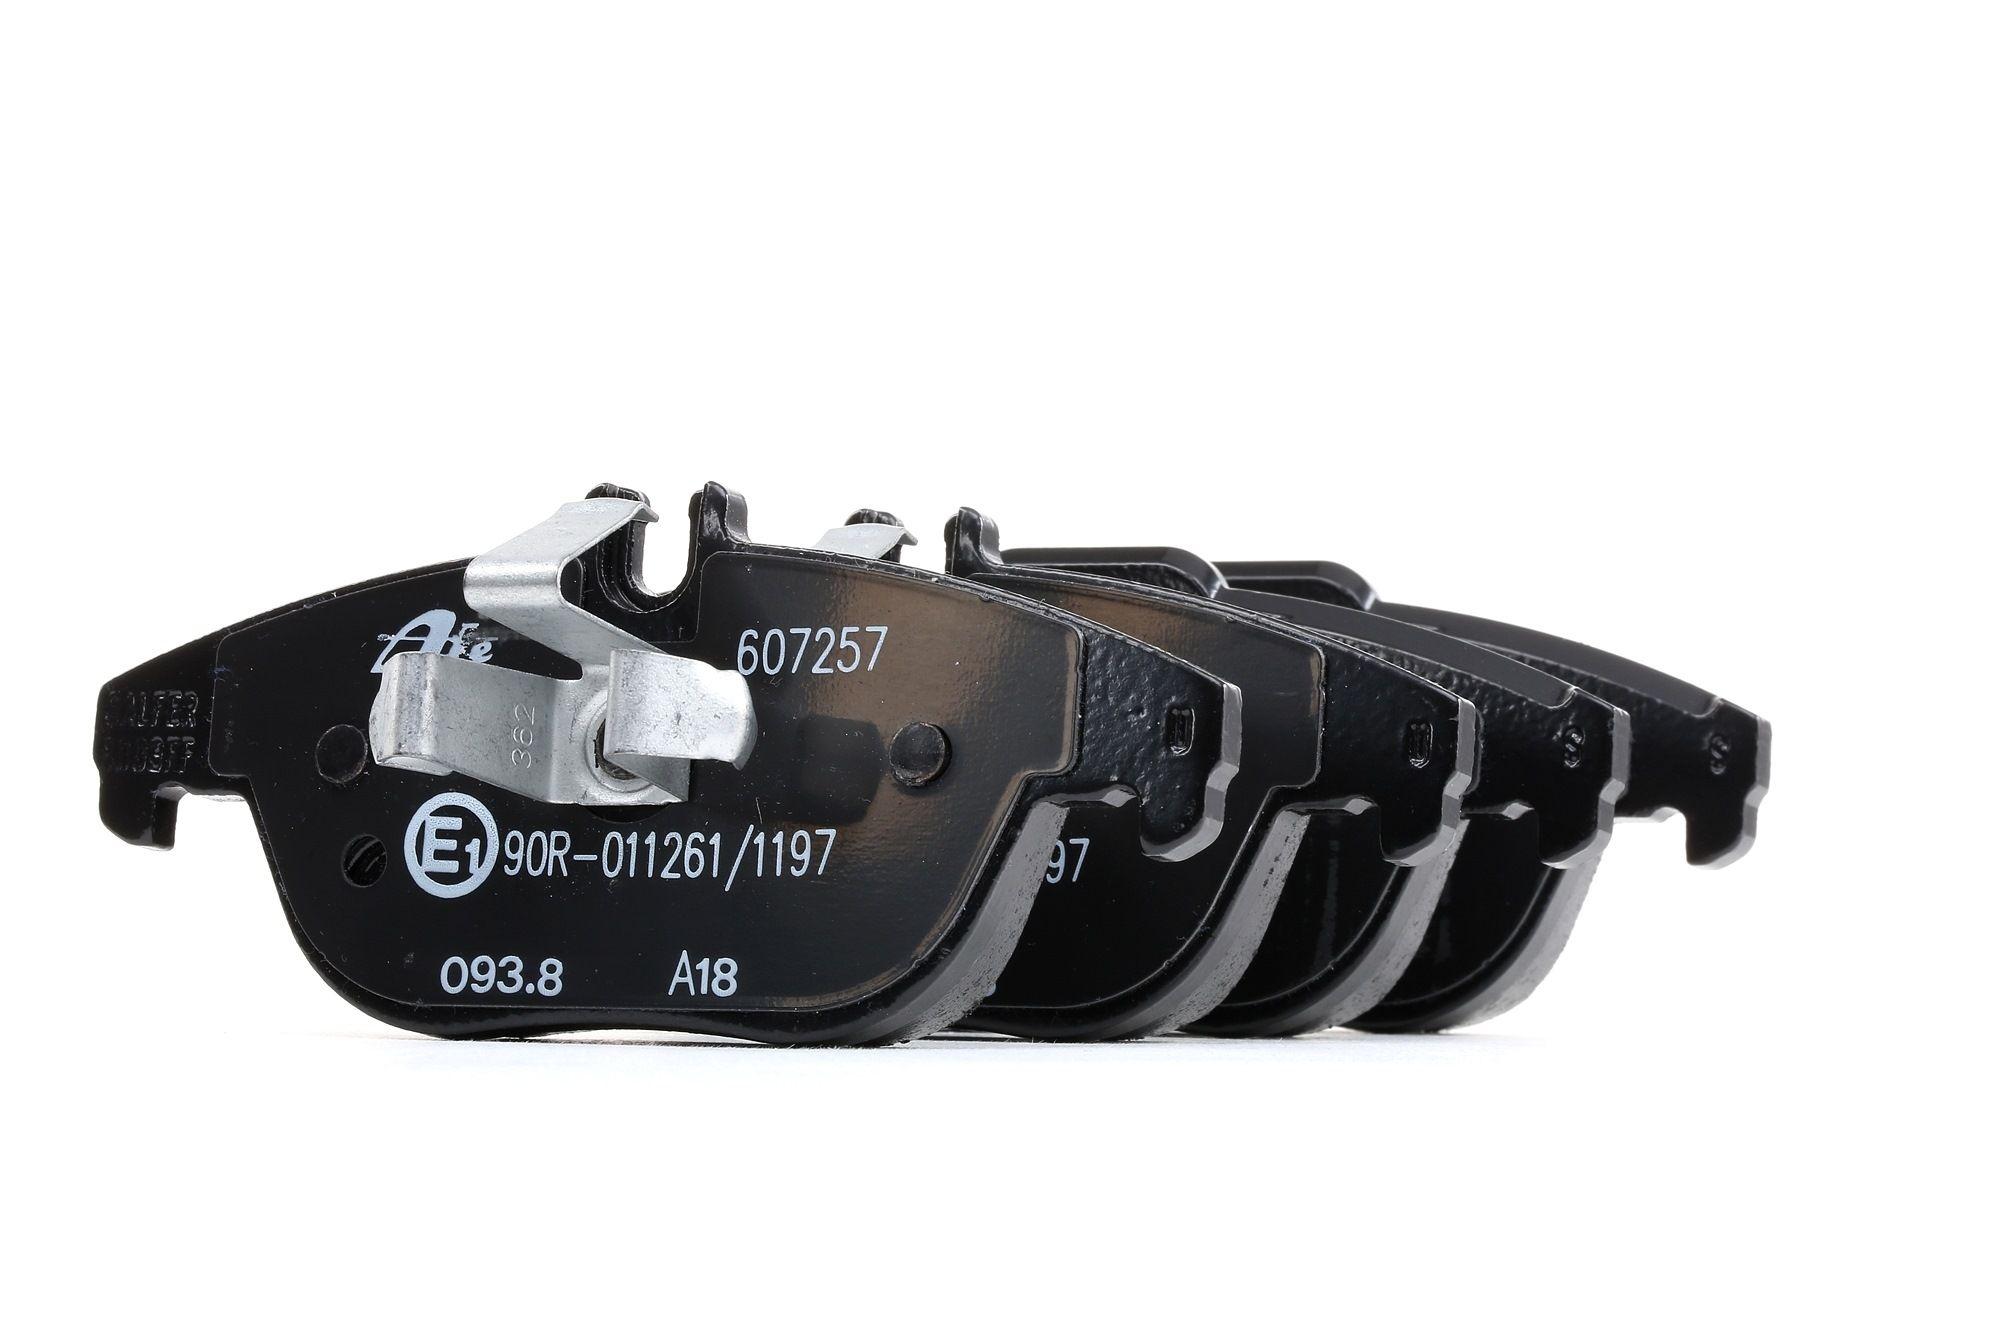 MERCEDES-BENZ GLK 2015 Bremsklötze - Original ATE 13.0460-7257.2 Höhe 1: 52,3mm, Höhe 2: 54,4mm, Breite 1: 122,5mm, Breite 2: 122,5mm, Dicke/Stärke: 18,0mm